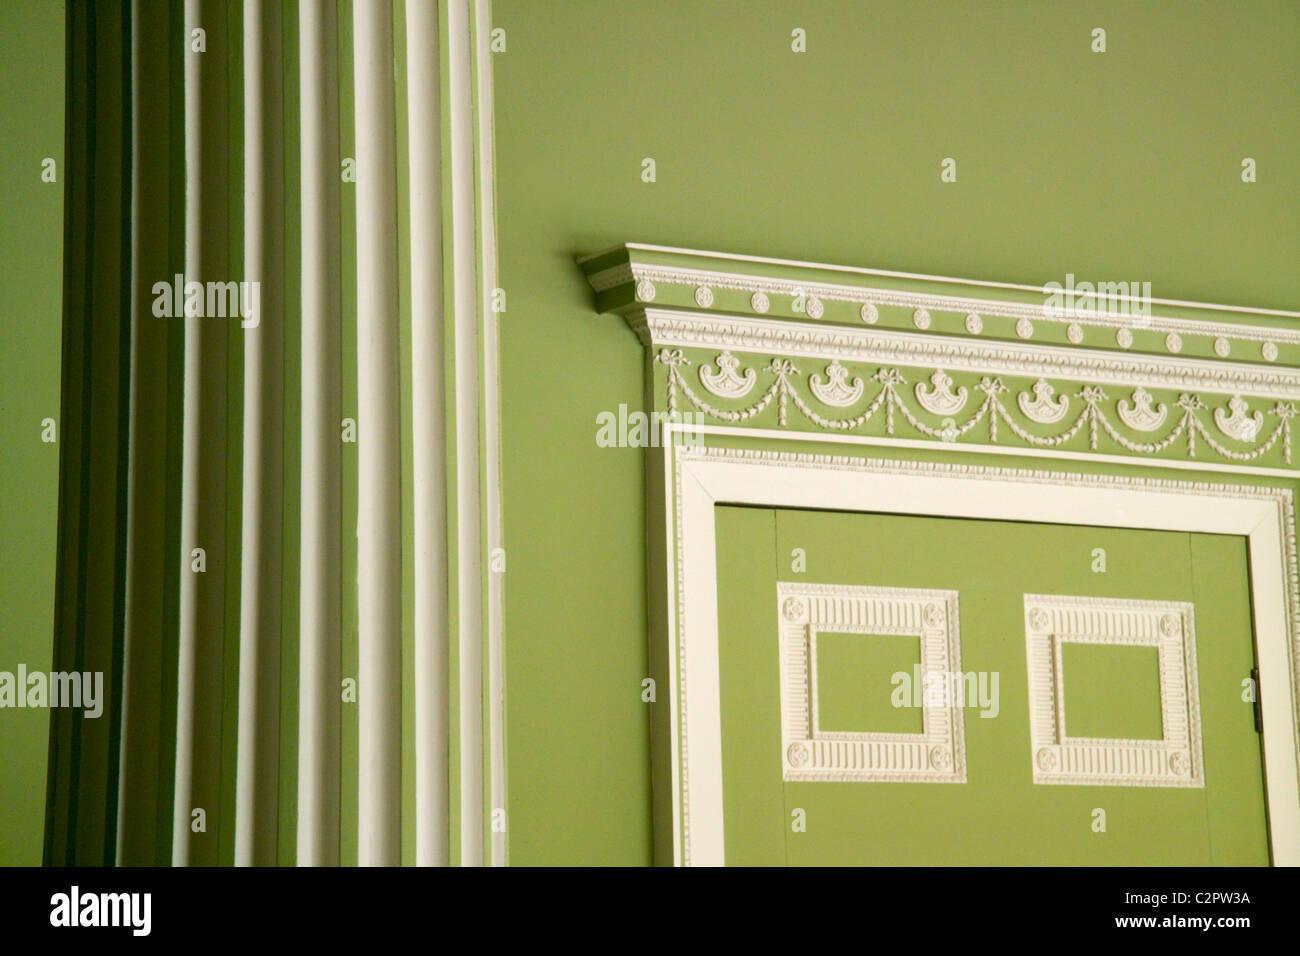 Decorative Moldings Stock Photos & Decorative Moldings Stock Images ...